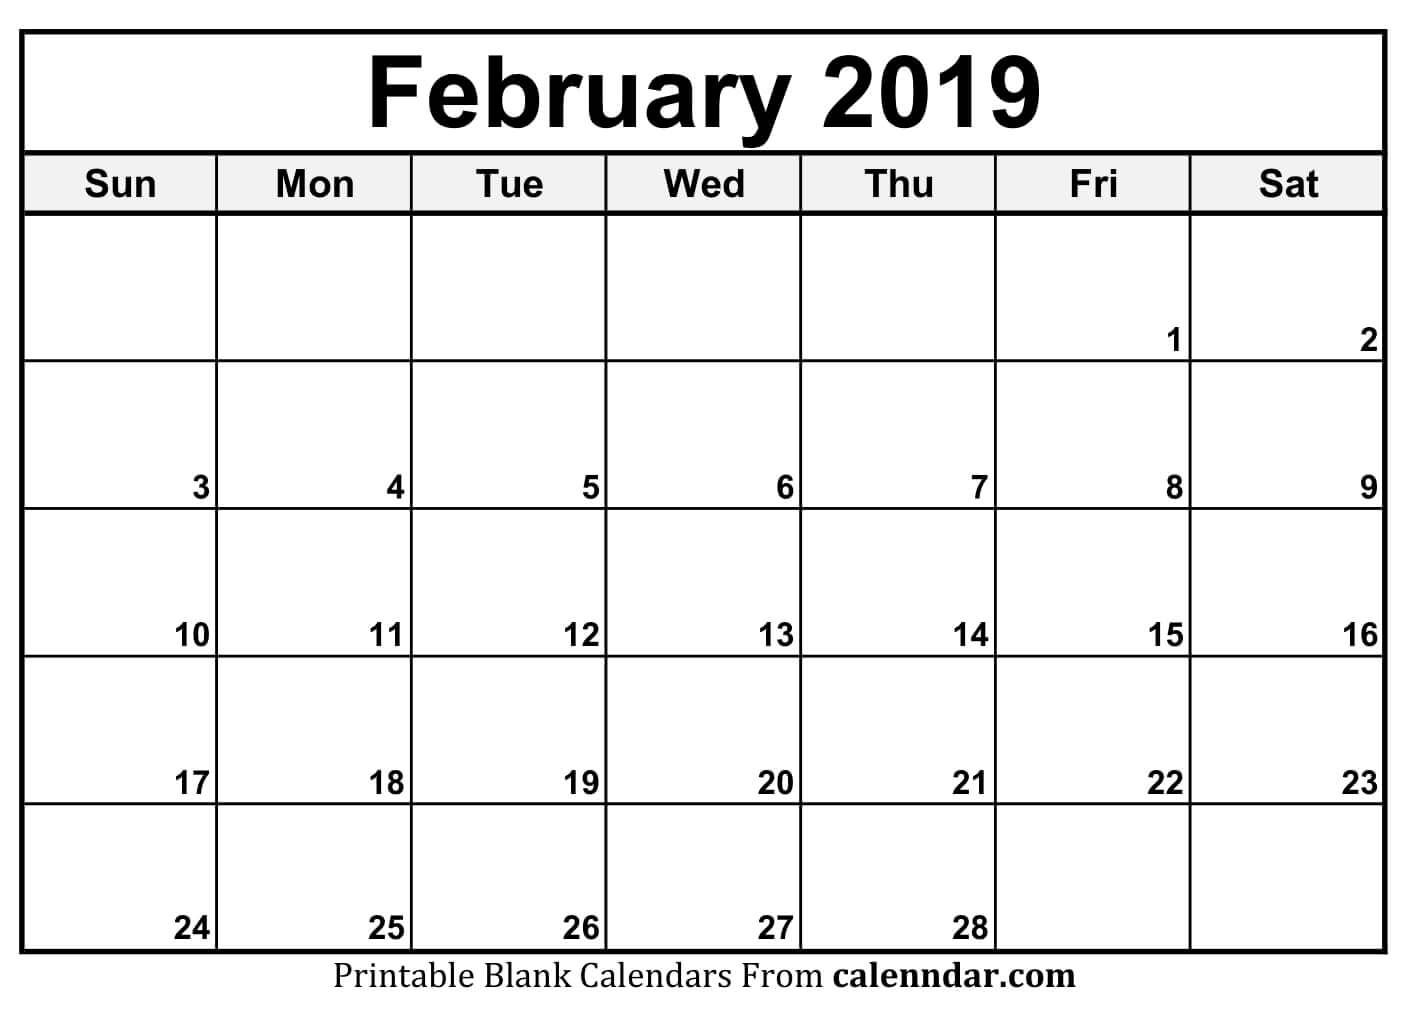 Free Printable Feb 2019 Calendar